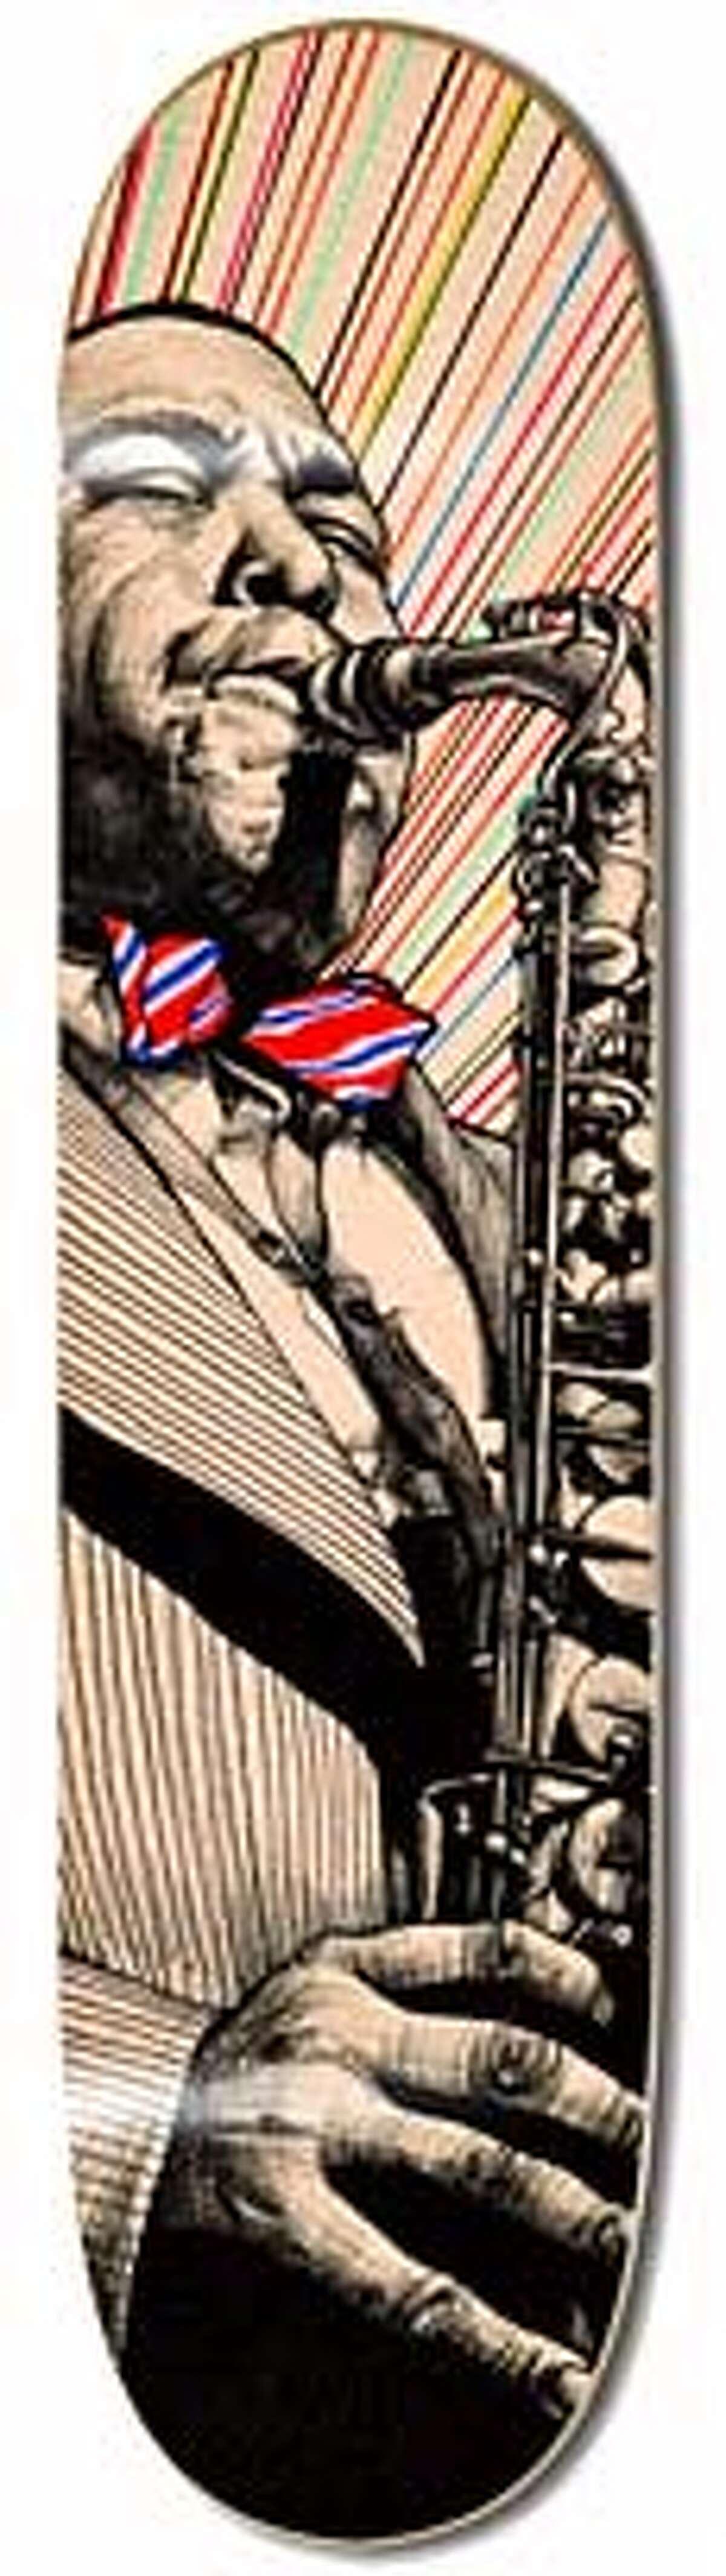 jazz inspired skateboard art by ian johnson